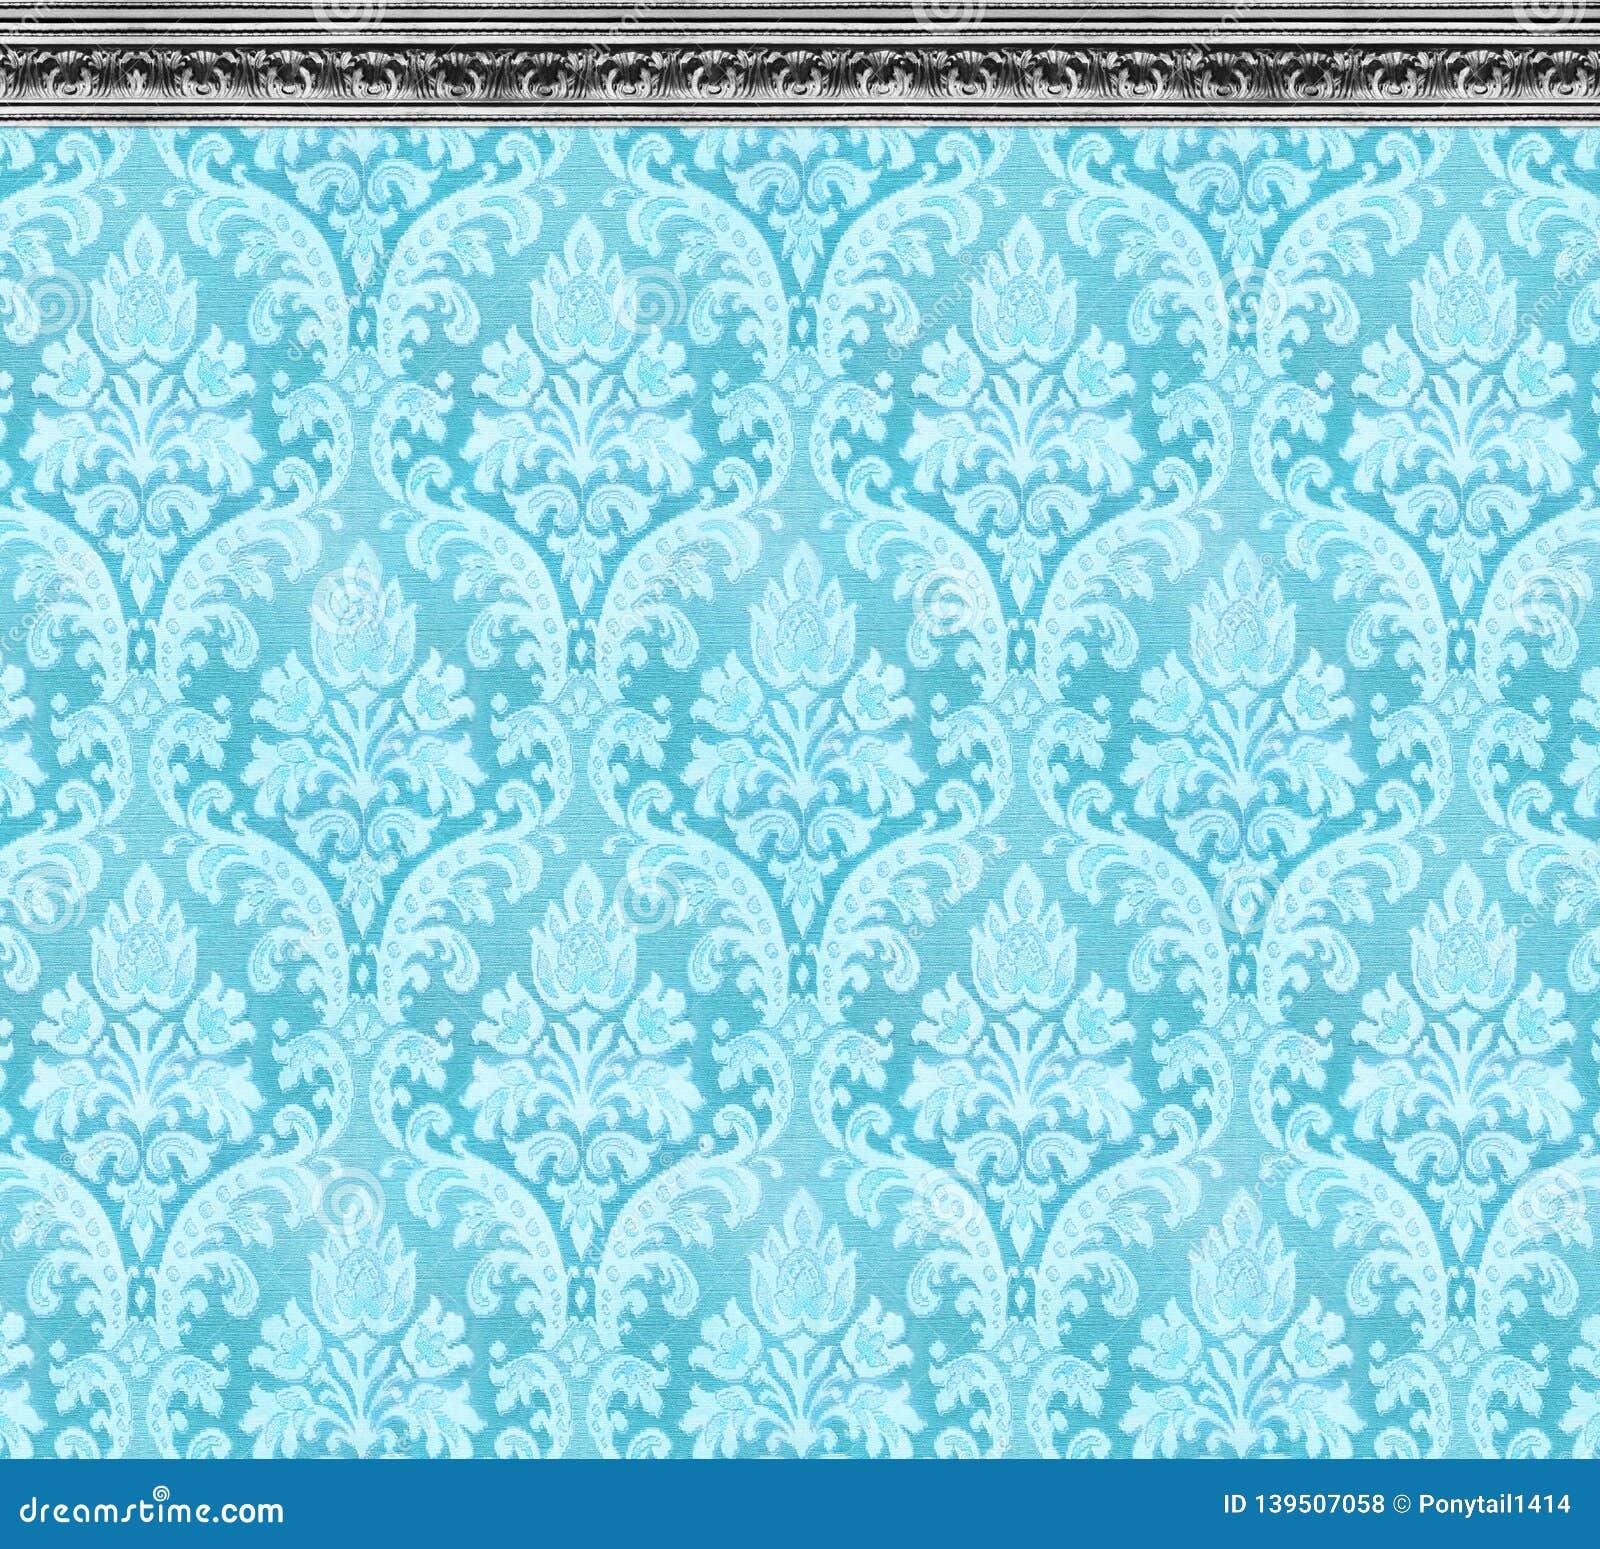 Elegant Wall of Aqua Damask Wallpaper With Ornate Molding